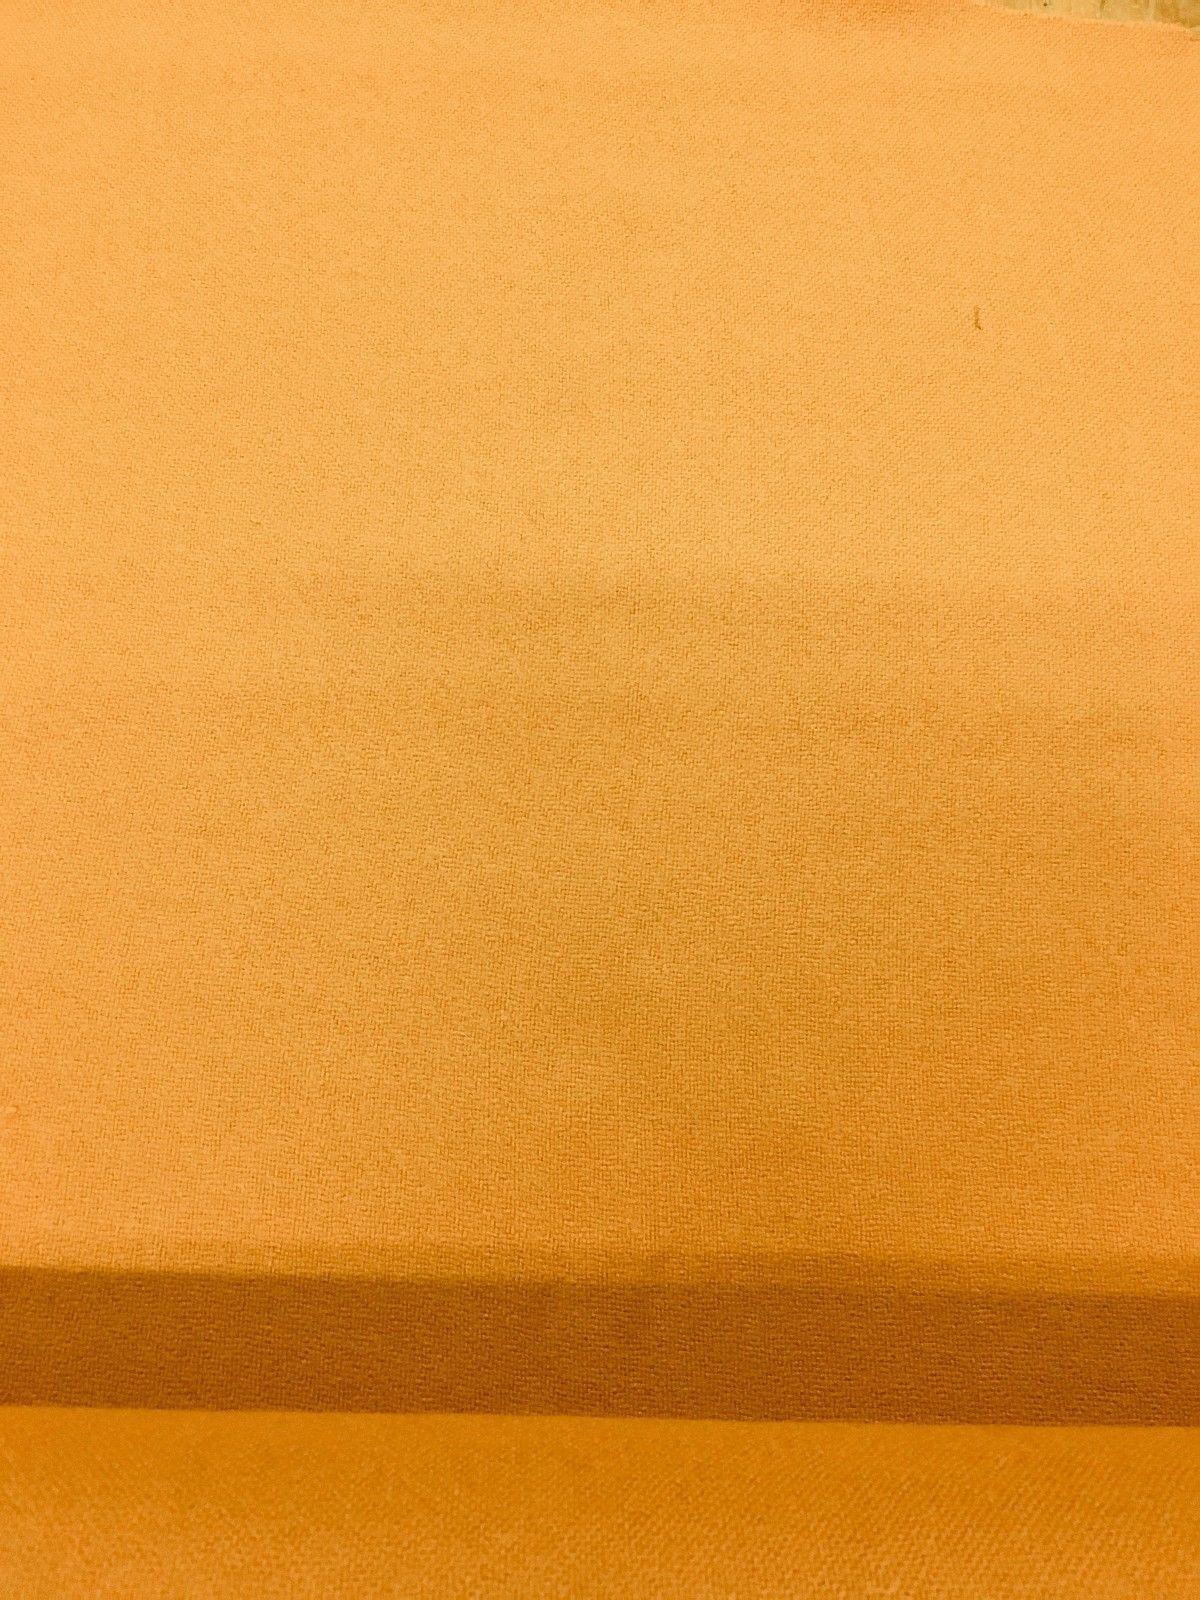 4.5 yds Mid Century Upholstery Fabric Hopsack Orange Wool AG